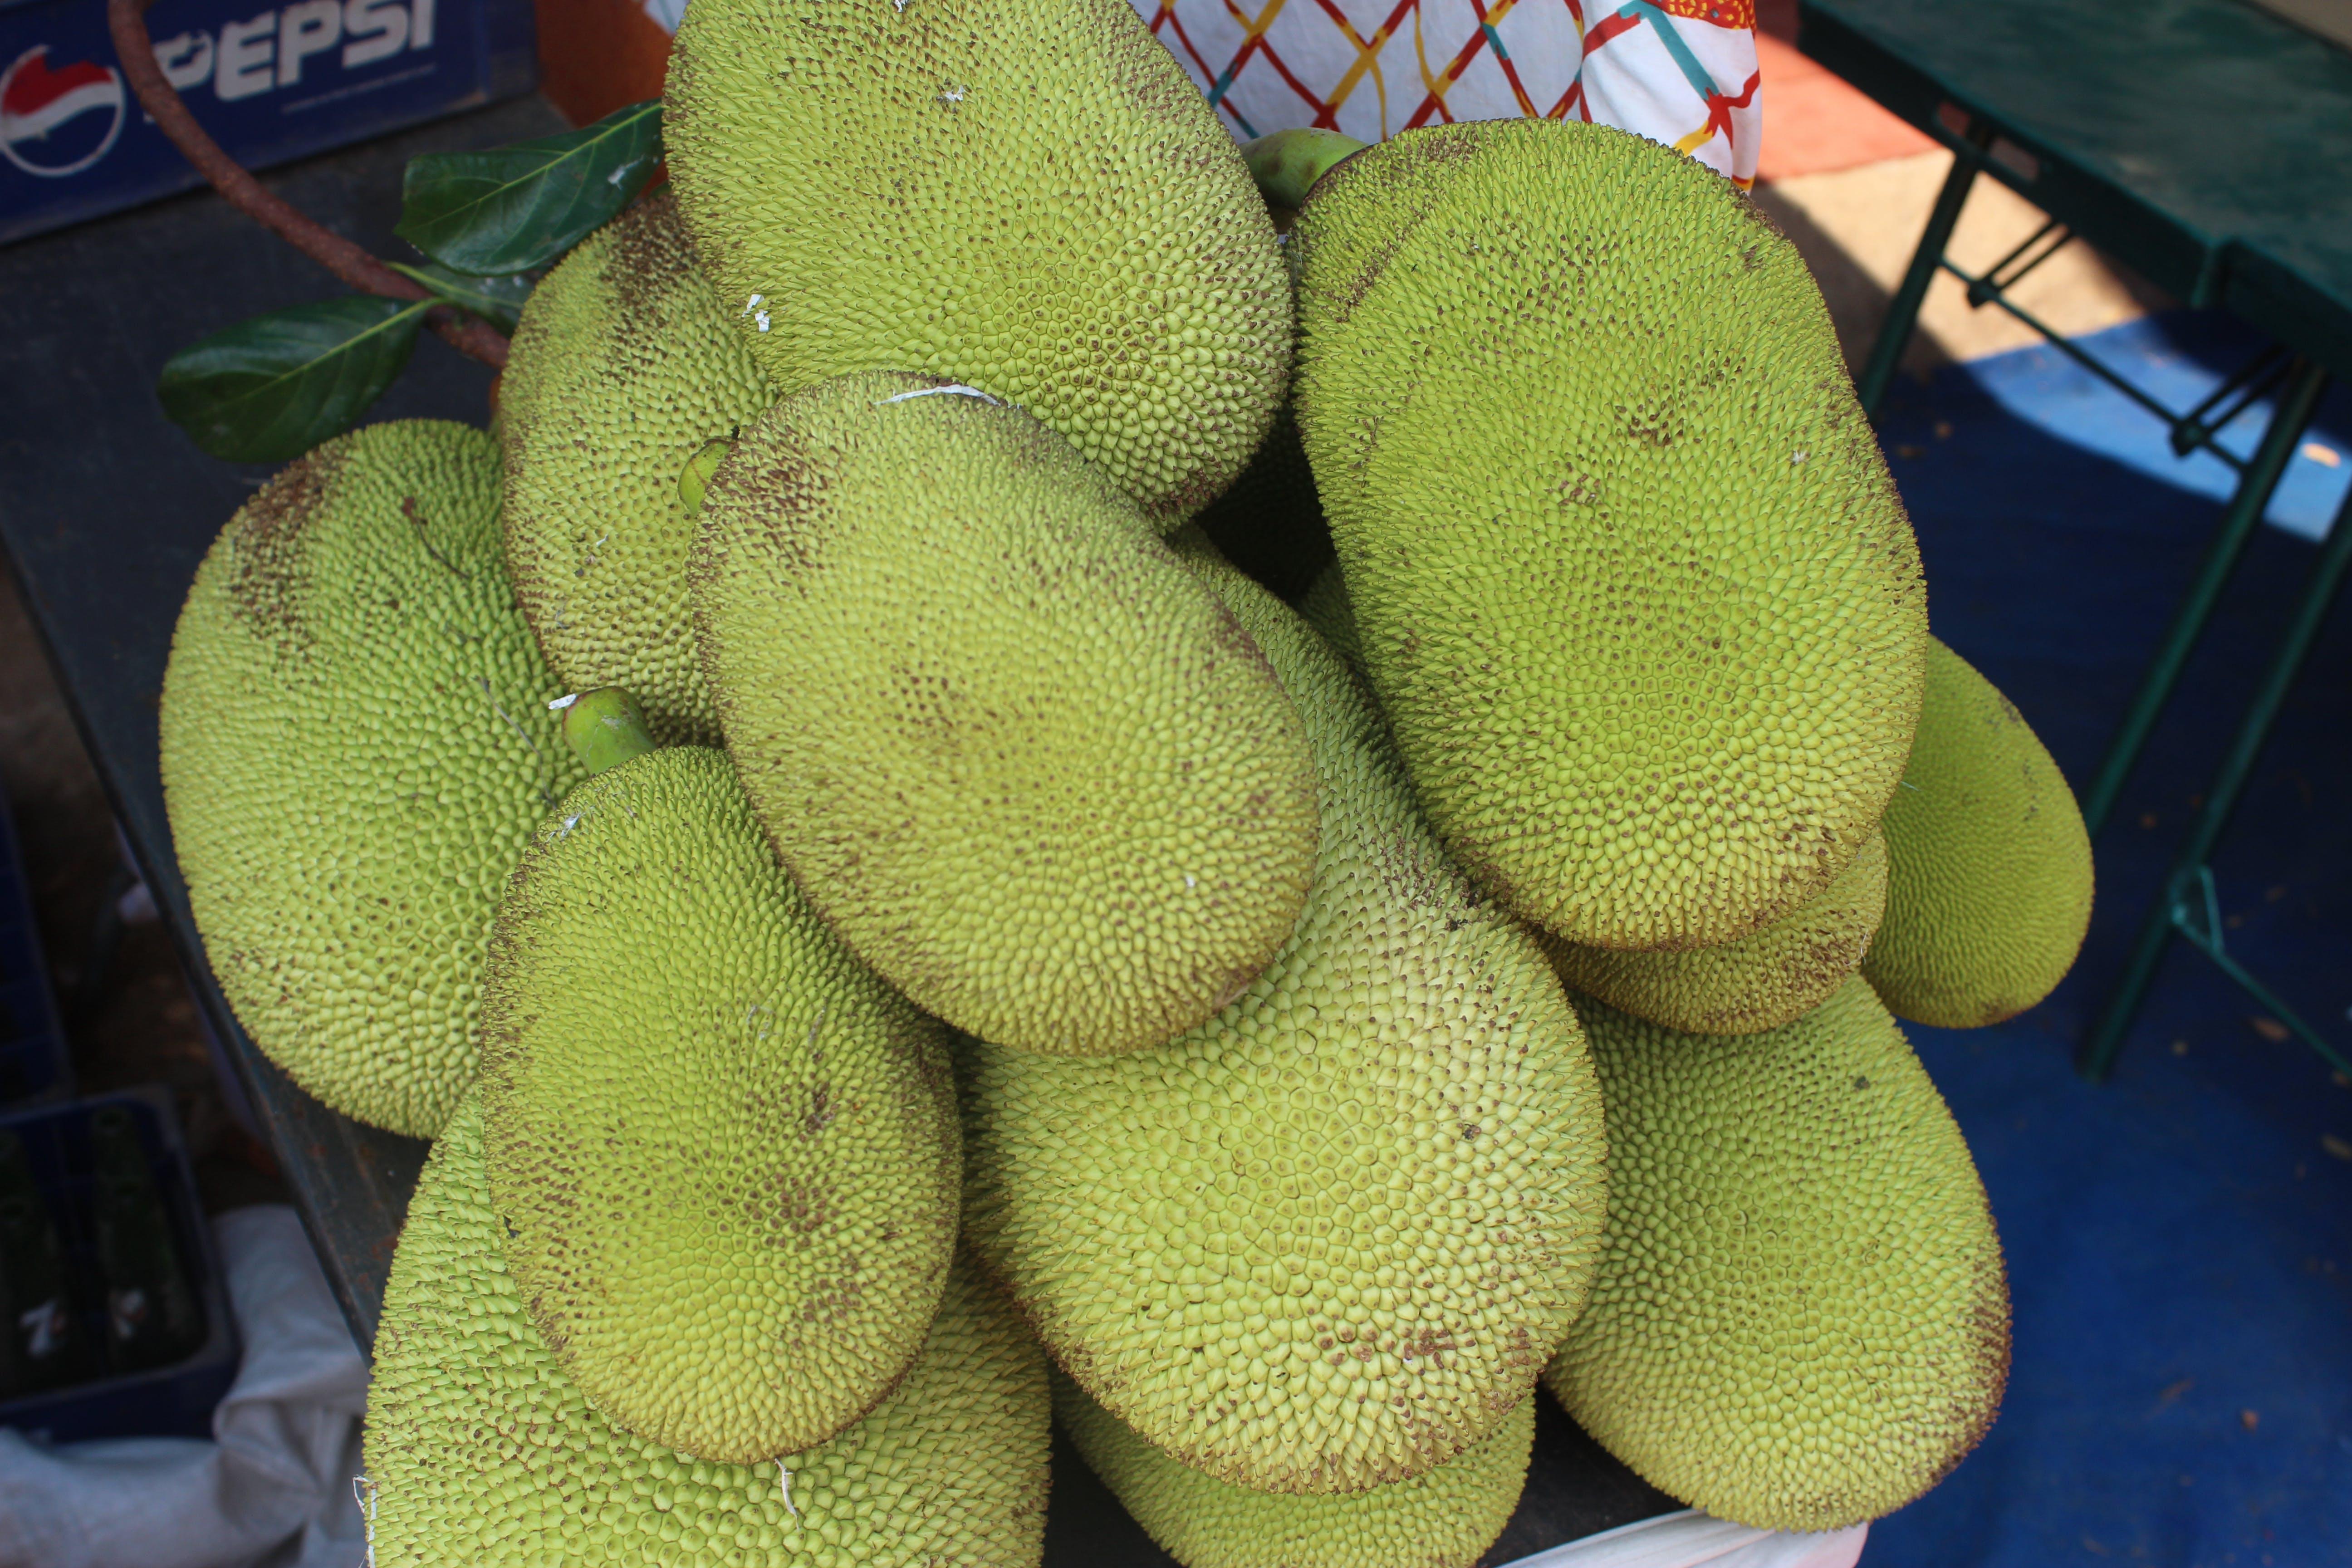 Kostenloses Stock Foto zu essen, früchte, juck, juck fruit lebensmittel